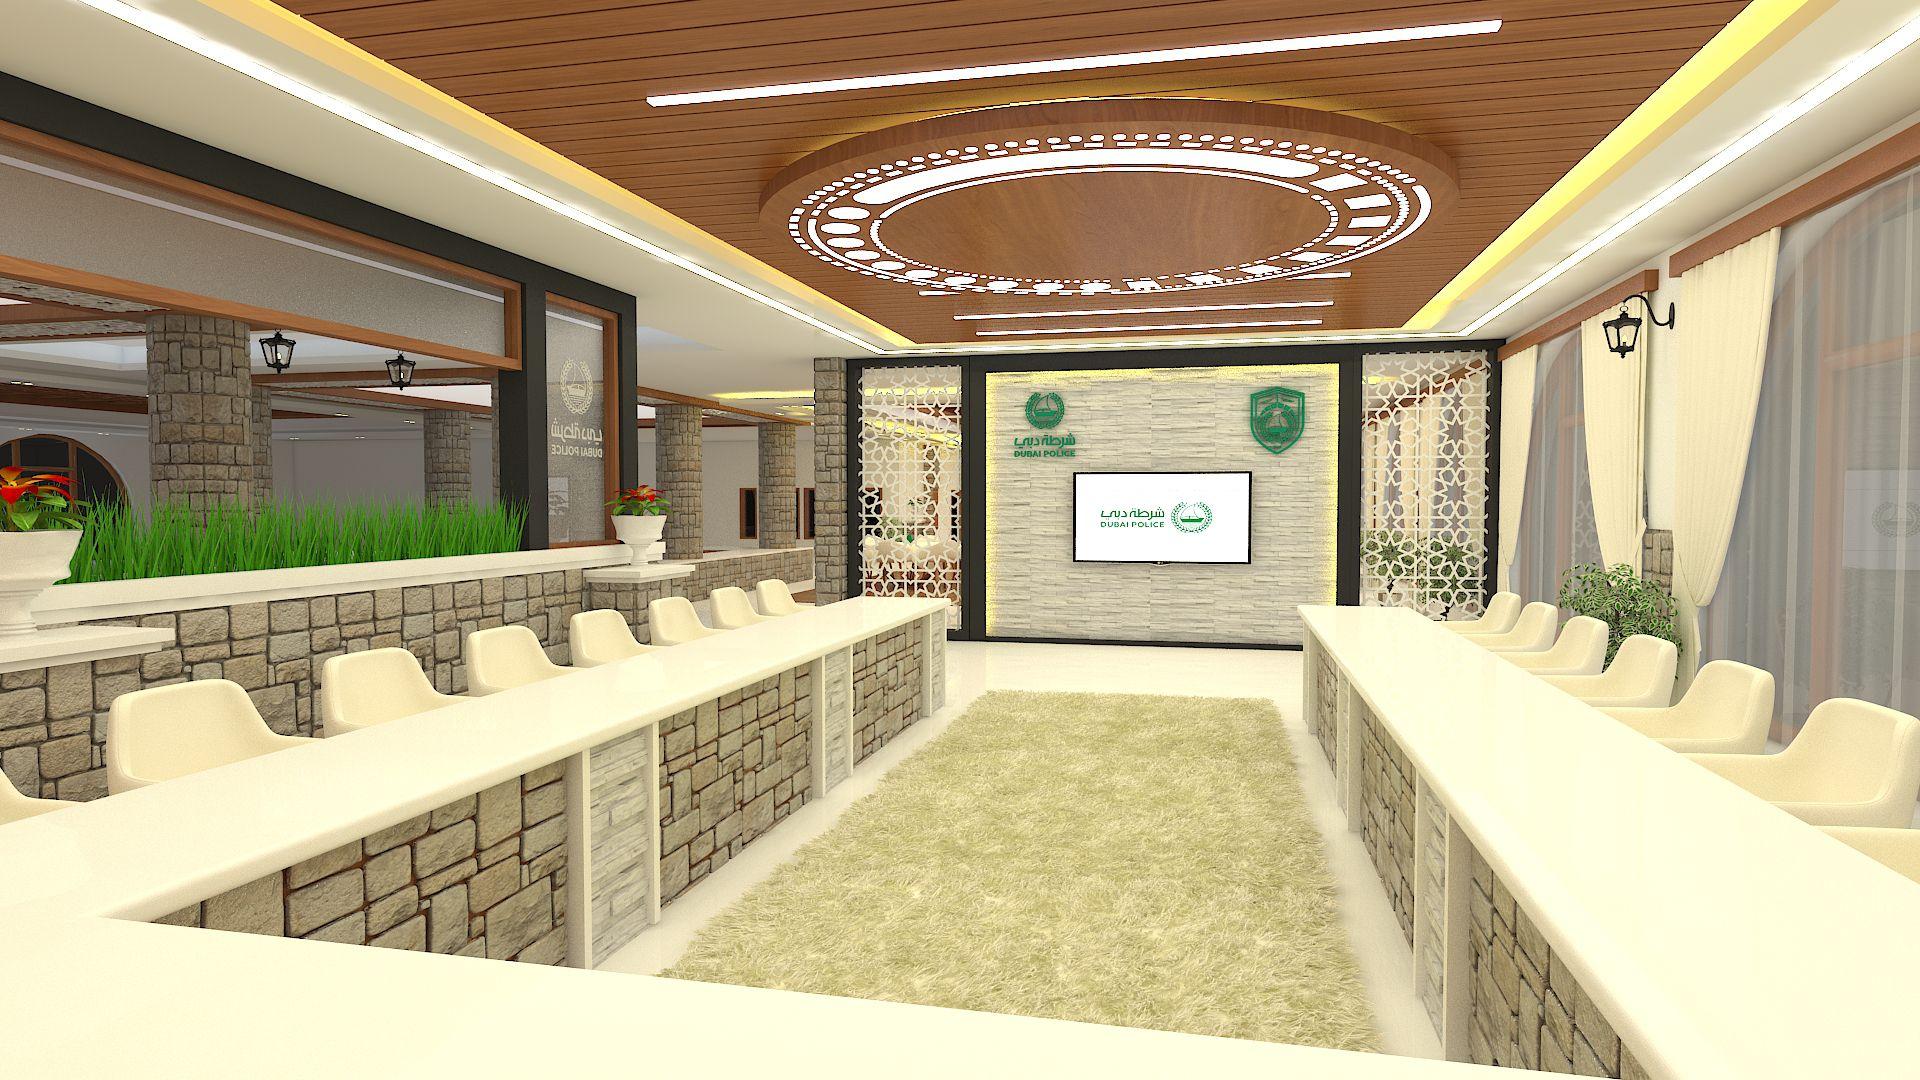 dubai-police-academy-interior-exterior-5